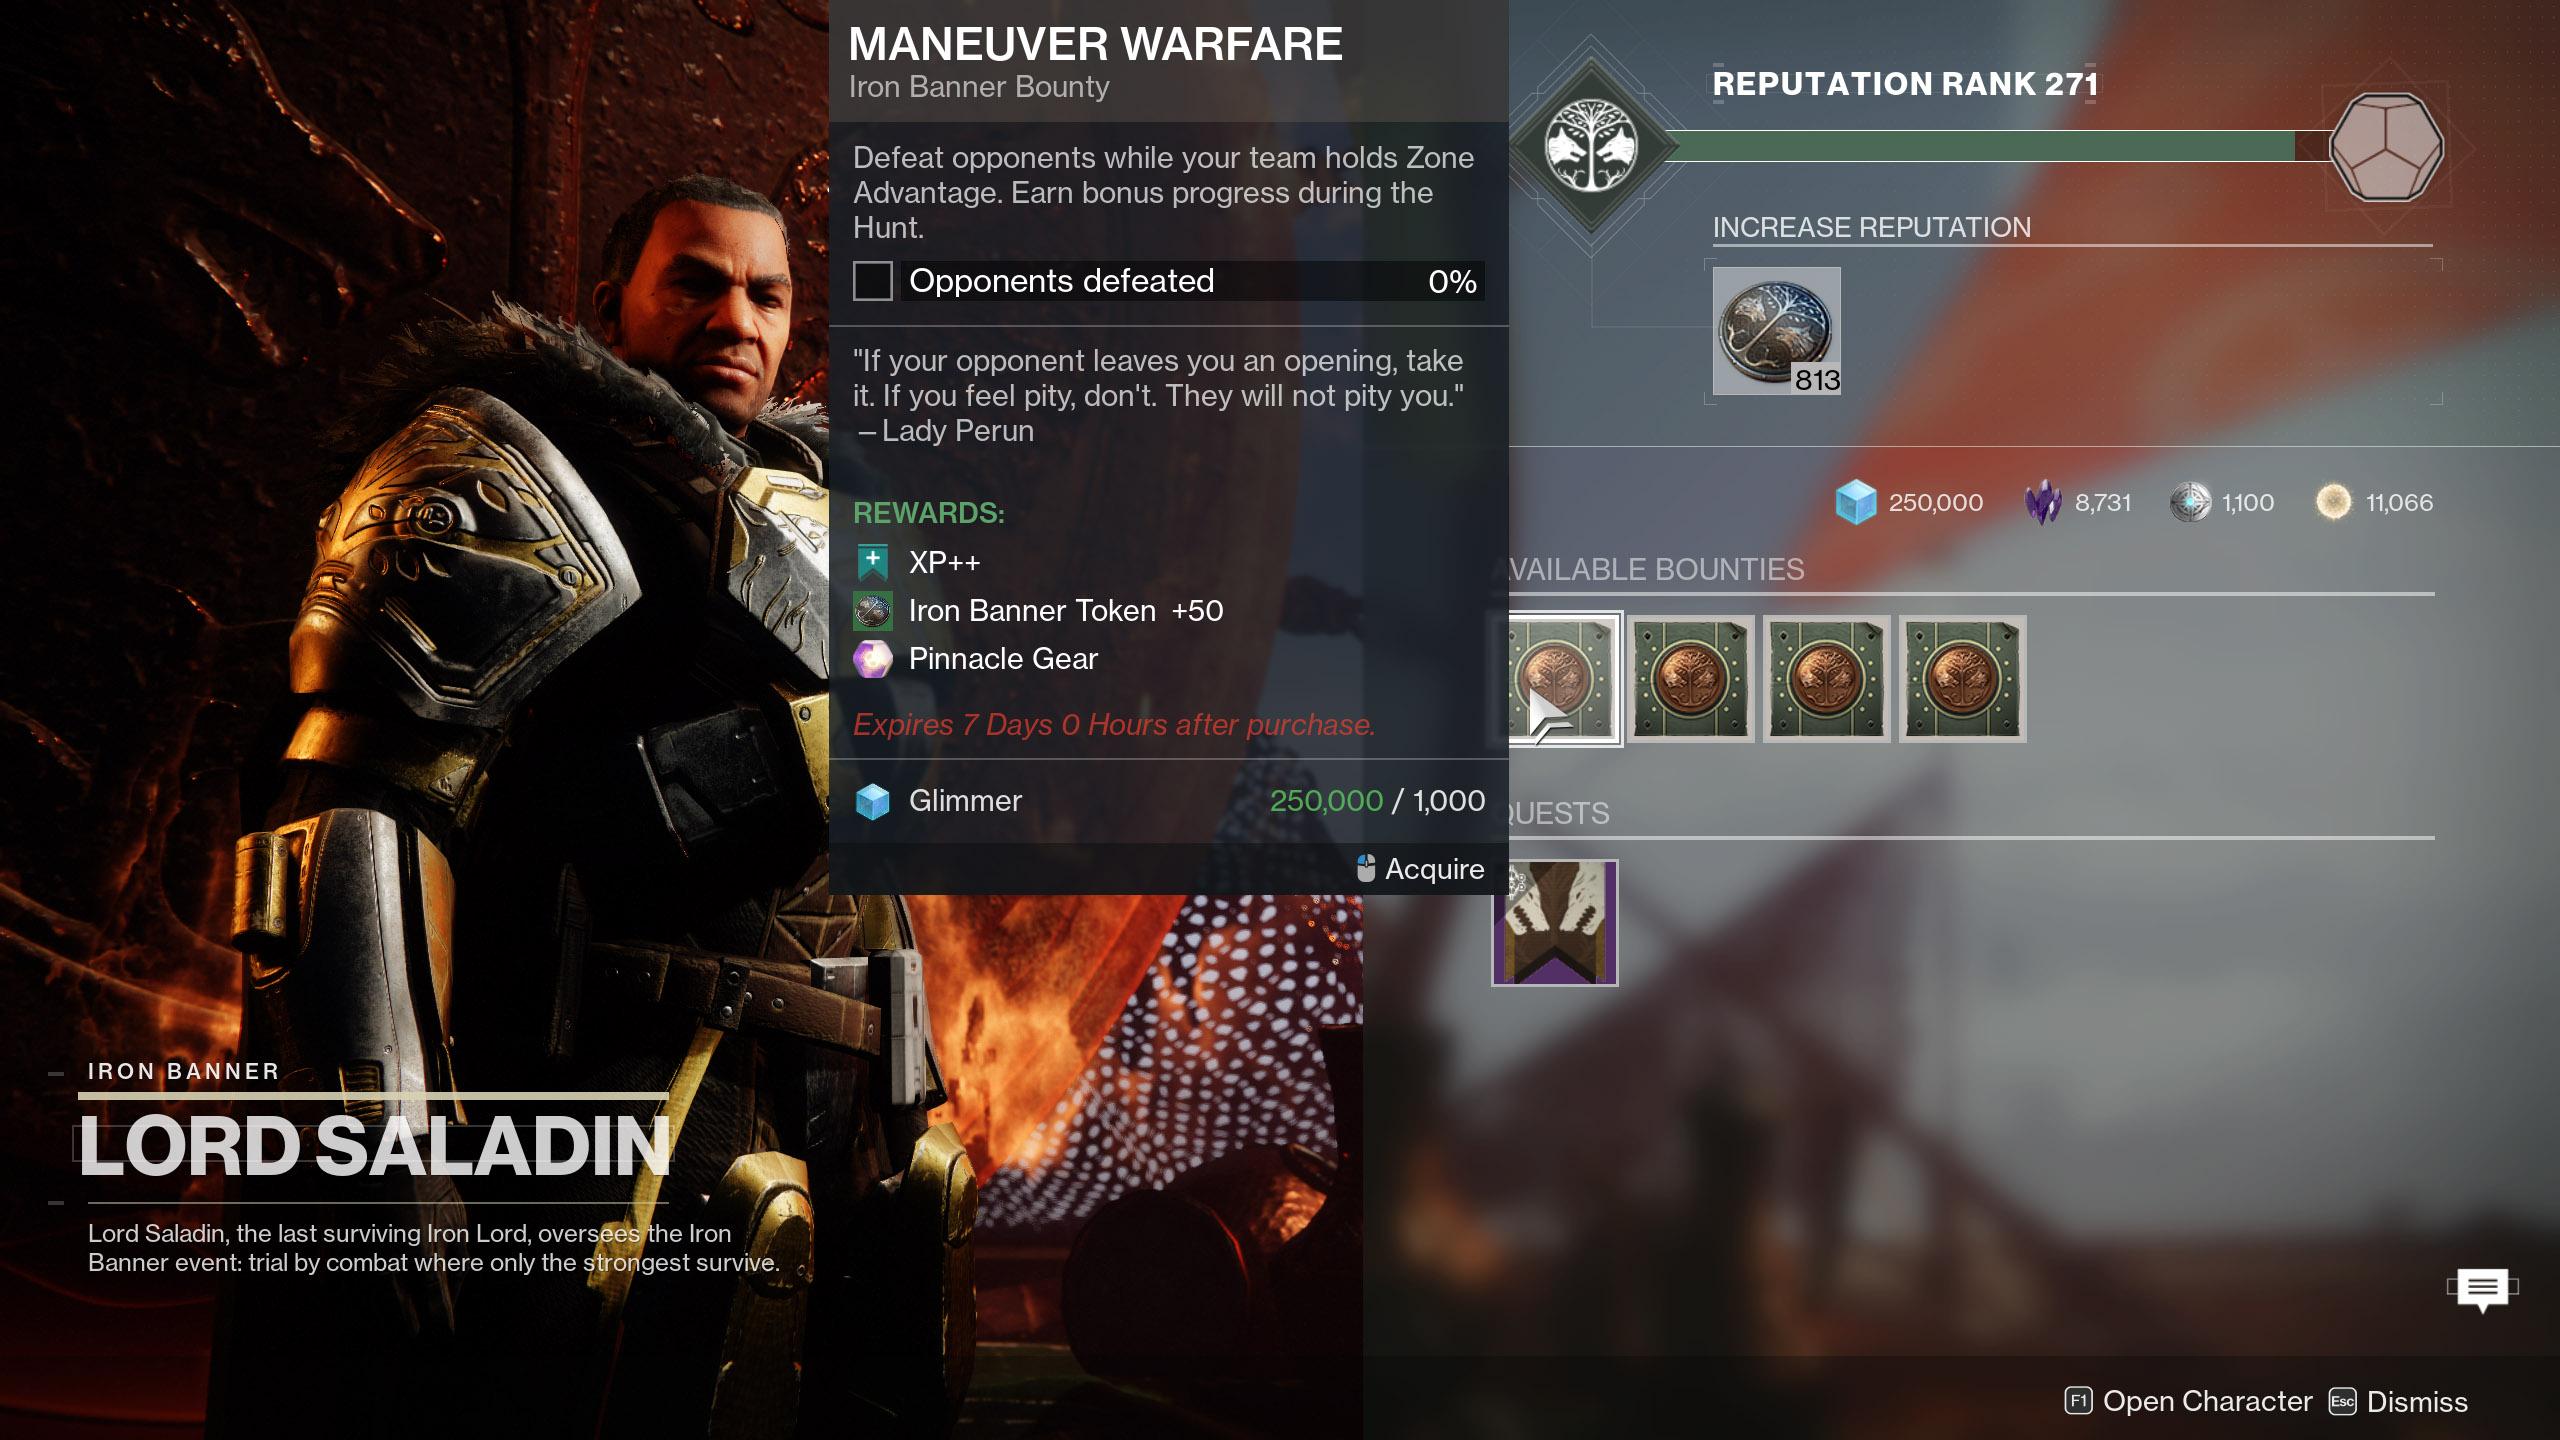 Iron Banner Season 15 Maneuver Warfare